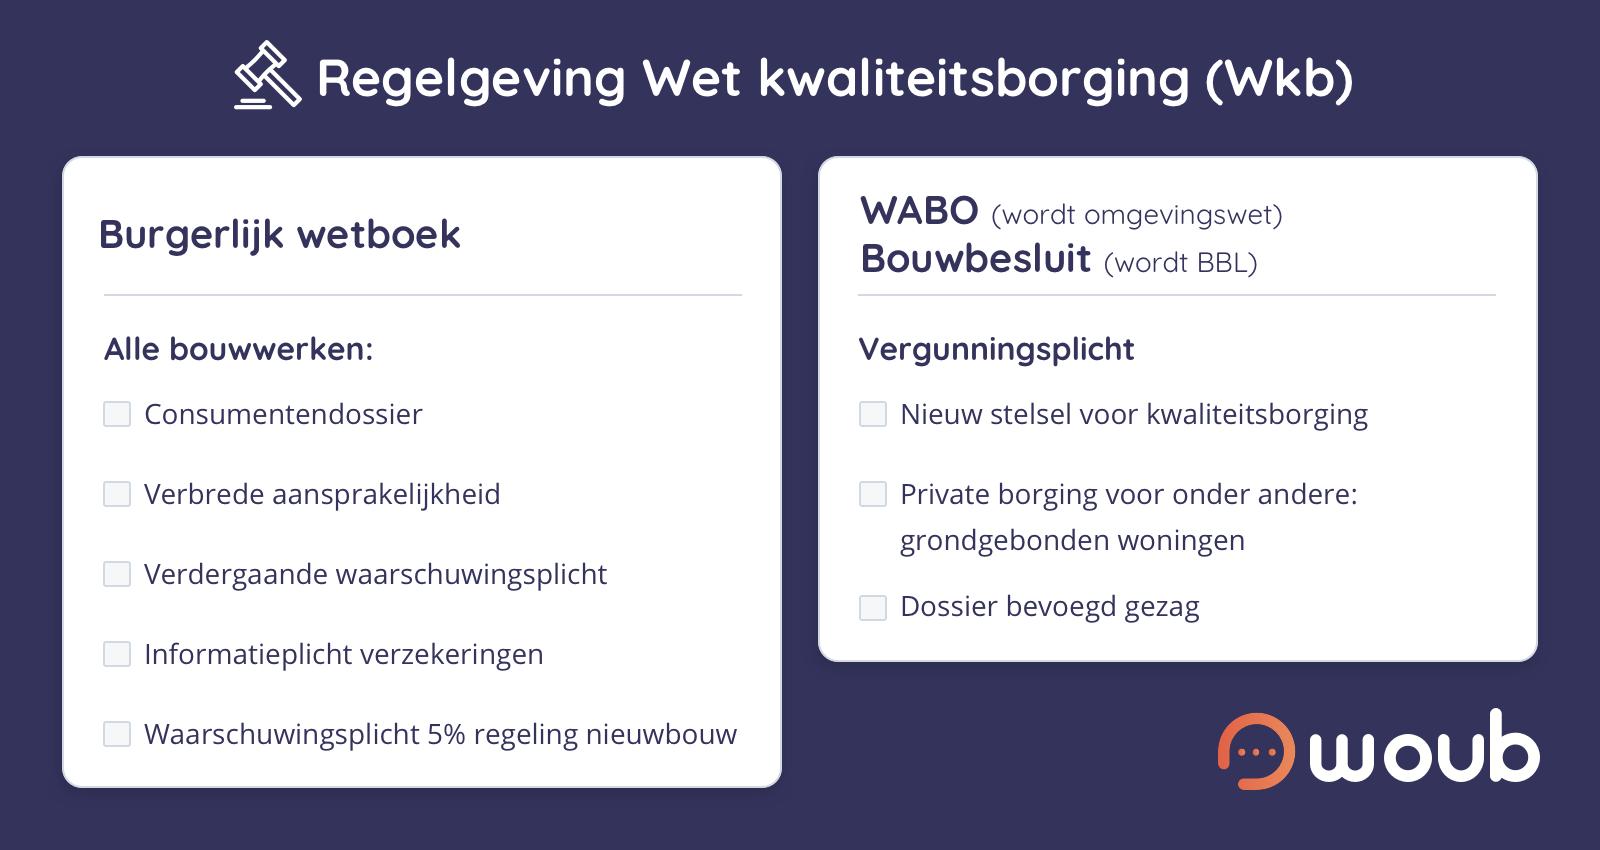 Regelgeving Wet kwaliteitsborging (Wkb)